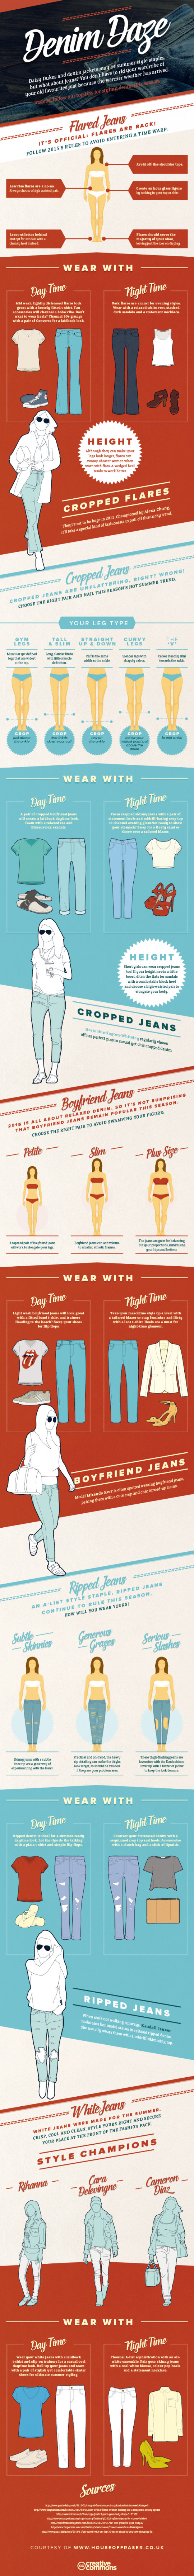 Denim Daze: A Jeans Style Guide